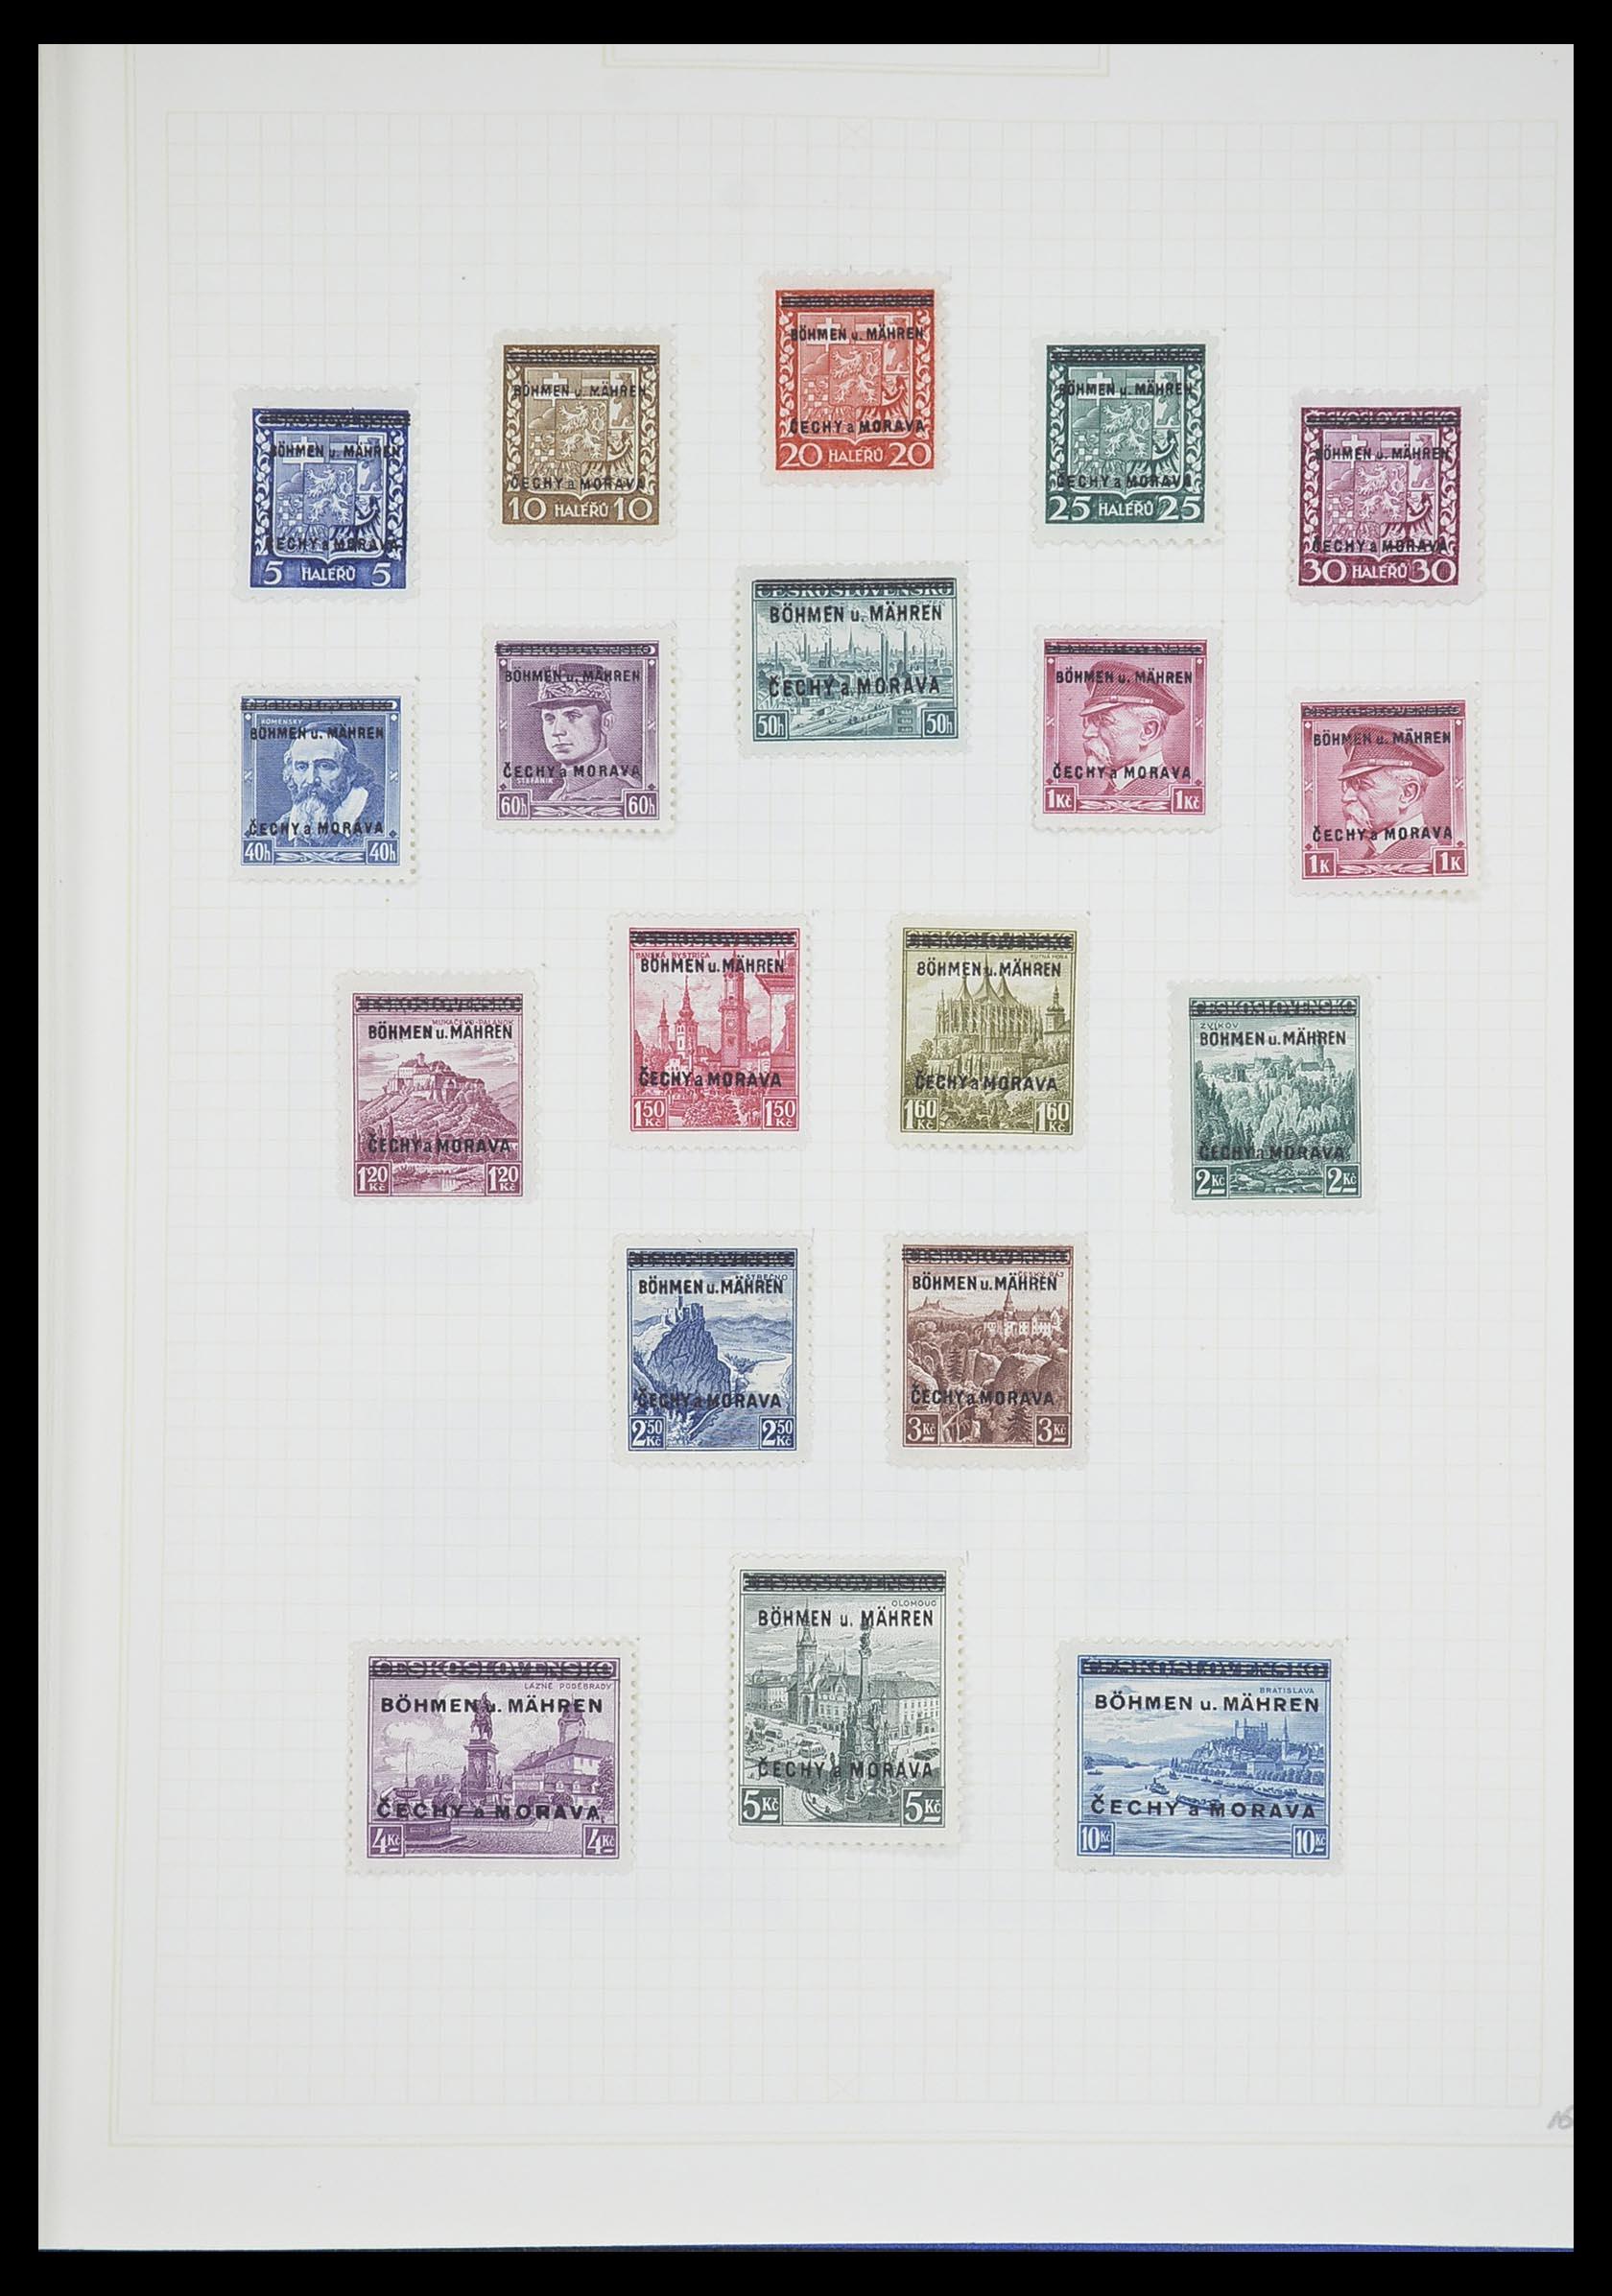 33713 012 - Postzegelverzameling 33713 Duitse bezettingen WO I en WO II 1914-1945